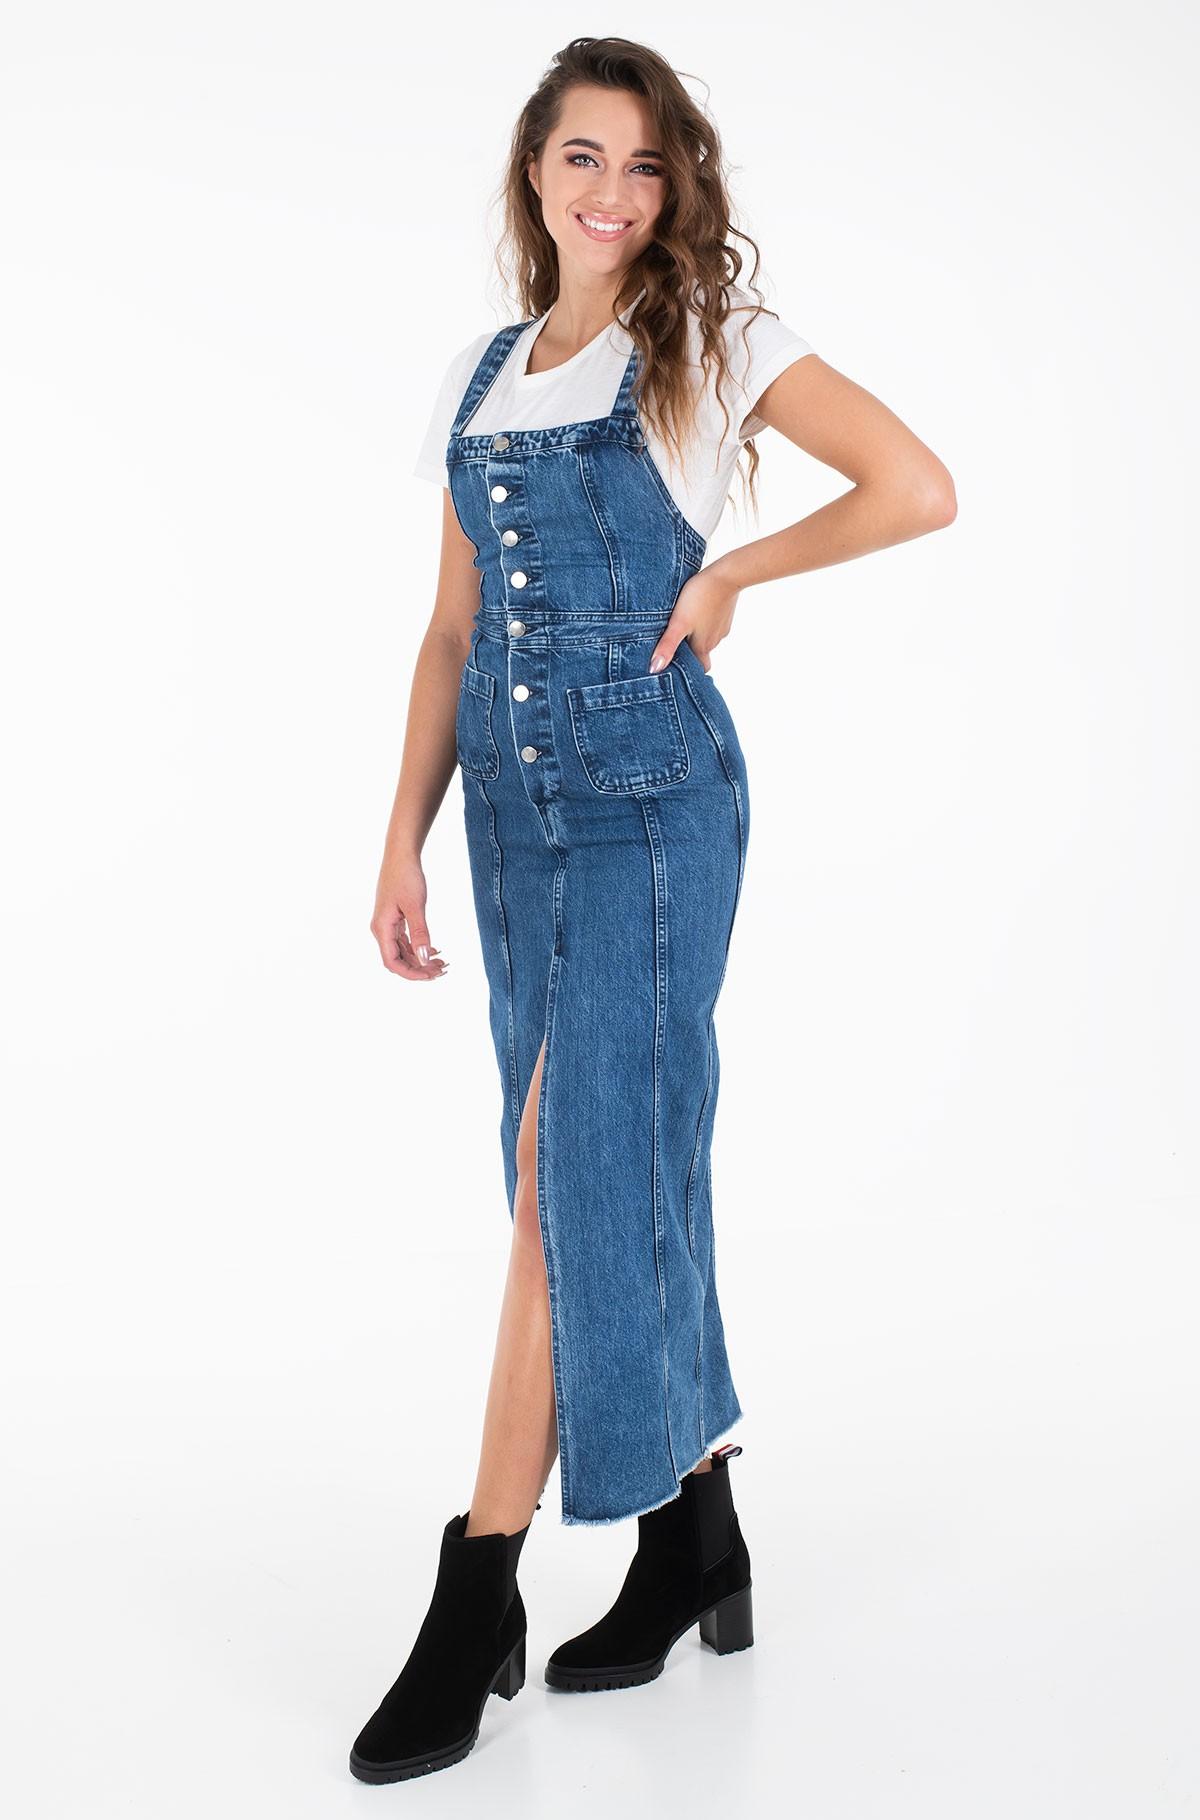 Denim dress LOTTIE/PL952614-full-1